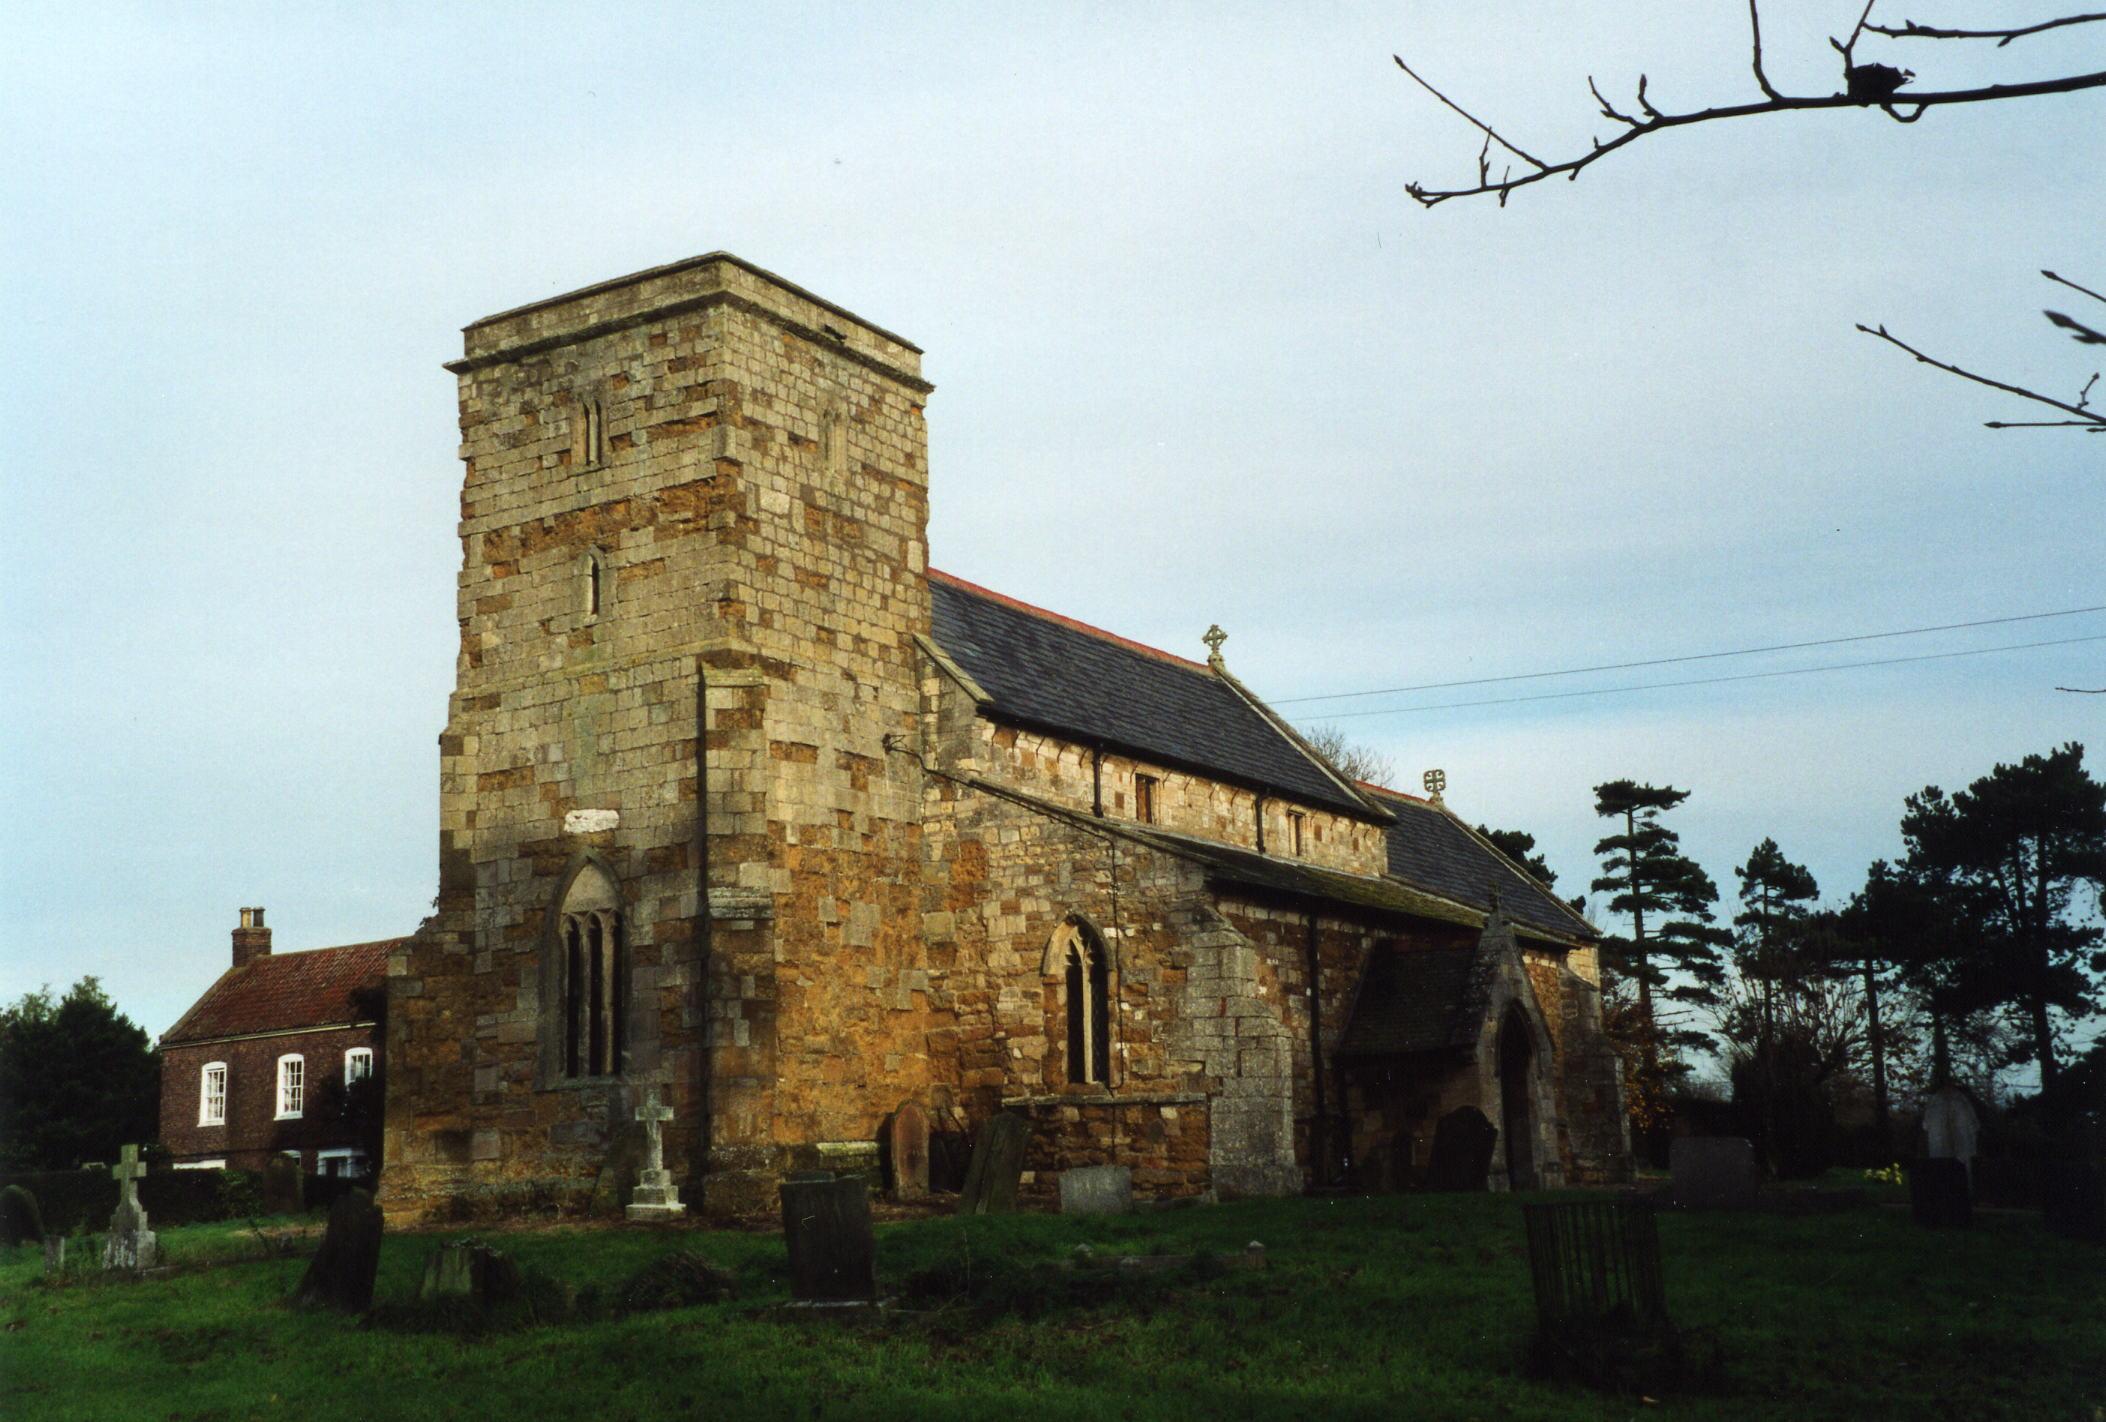 Peter's church